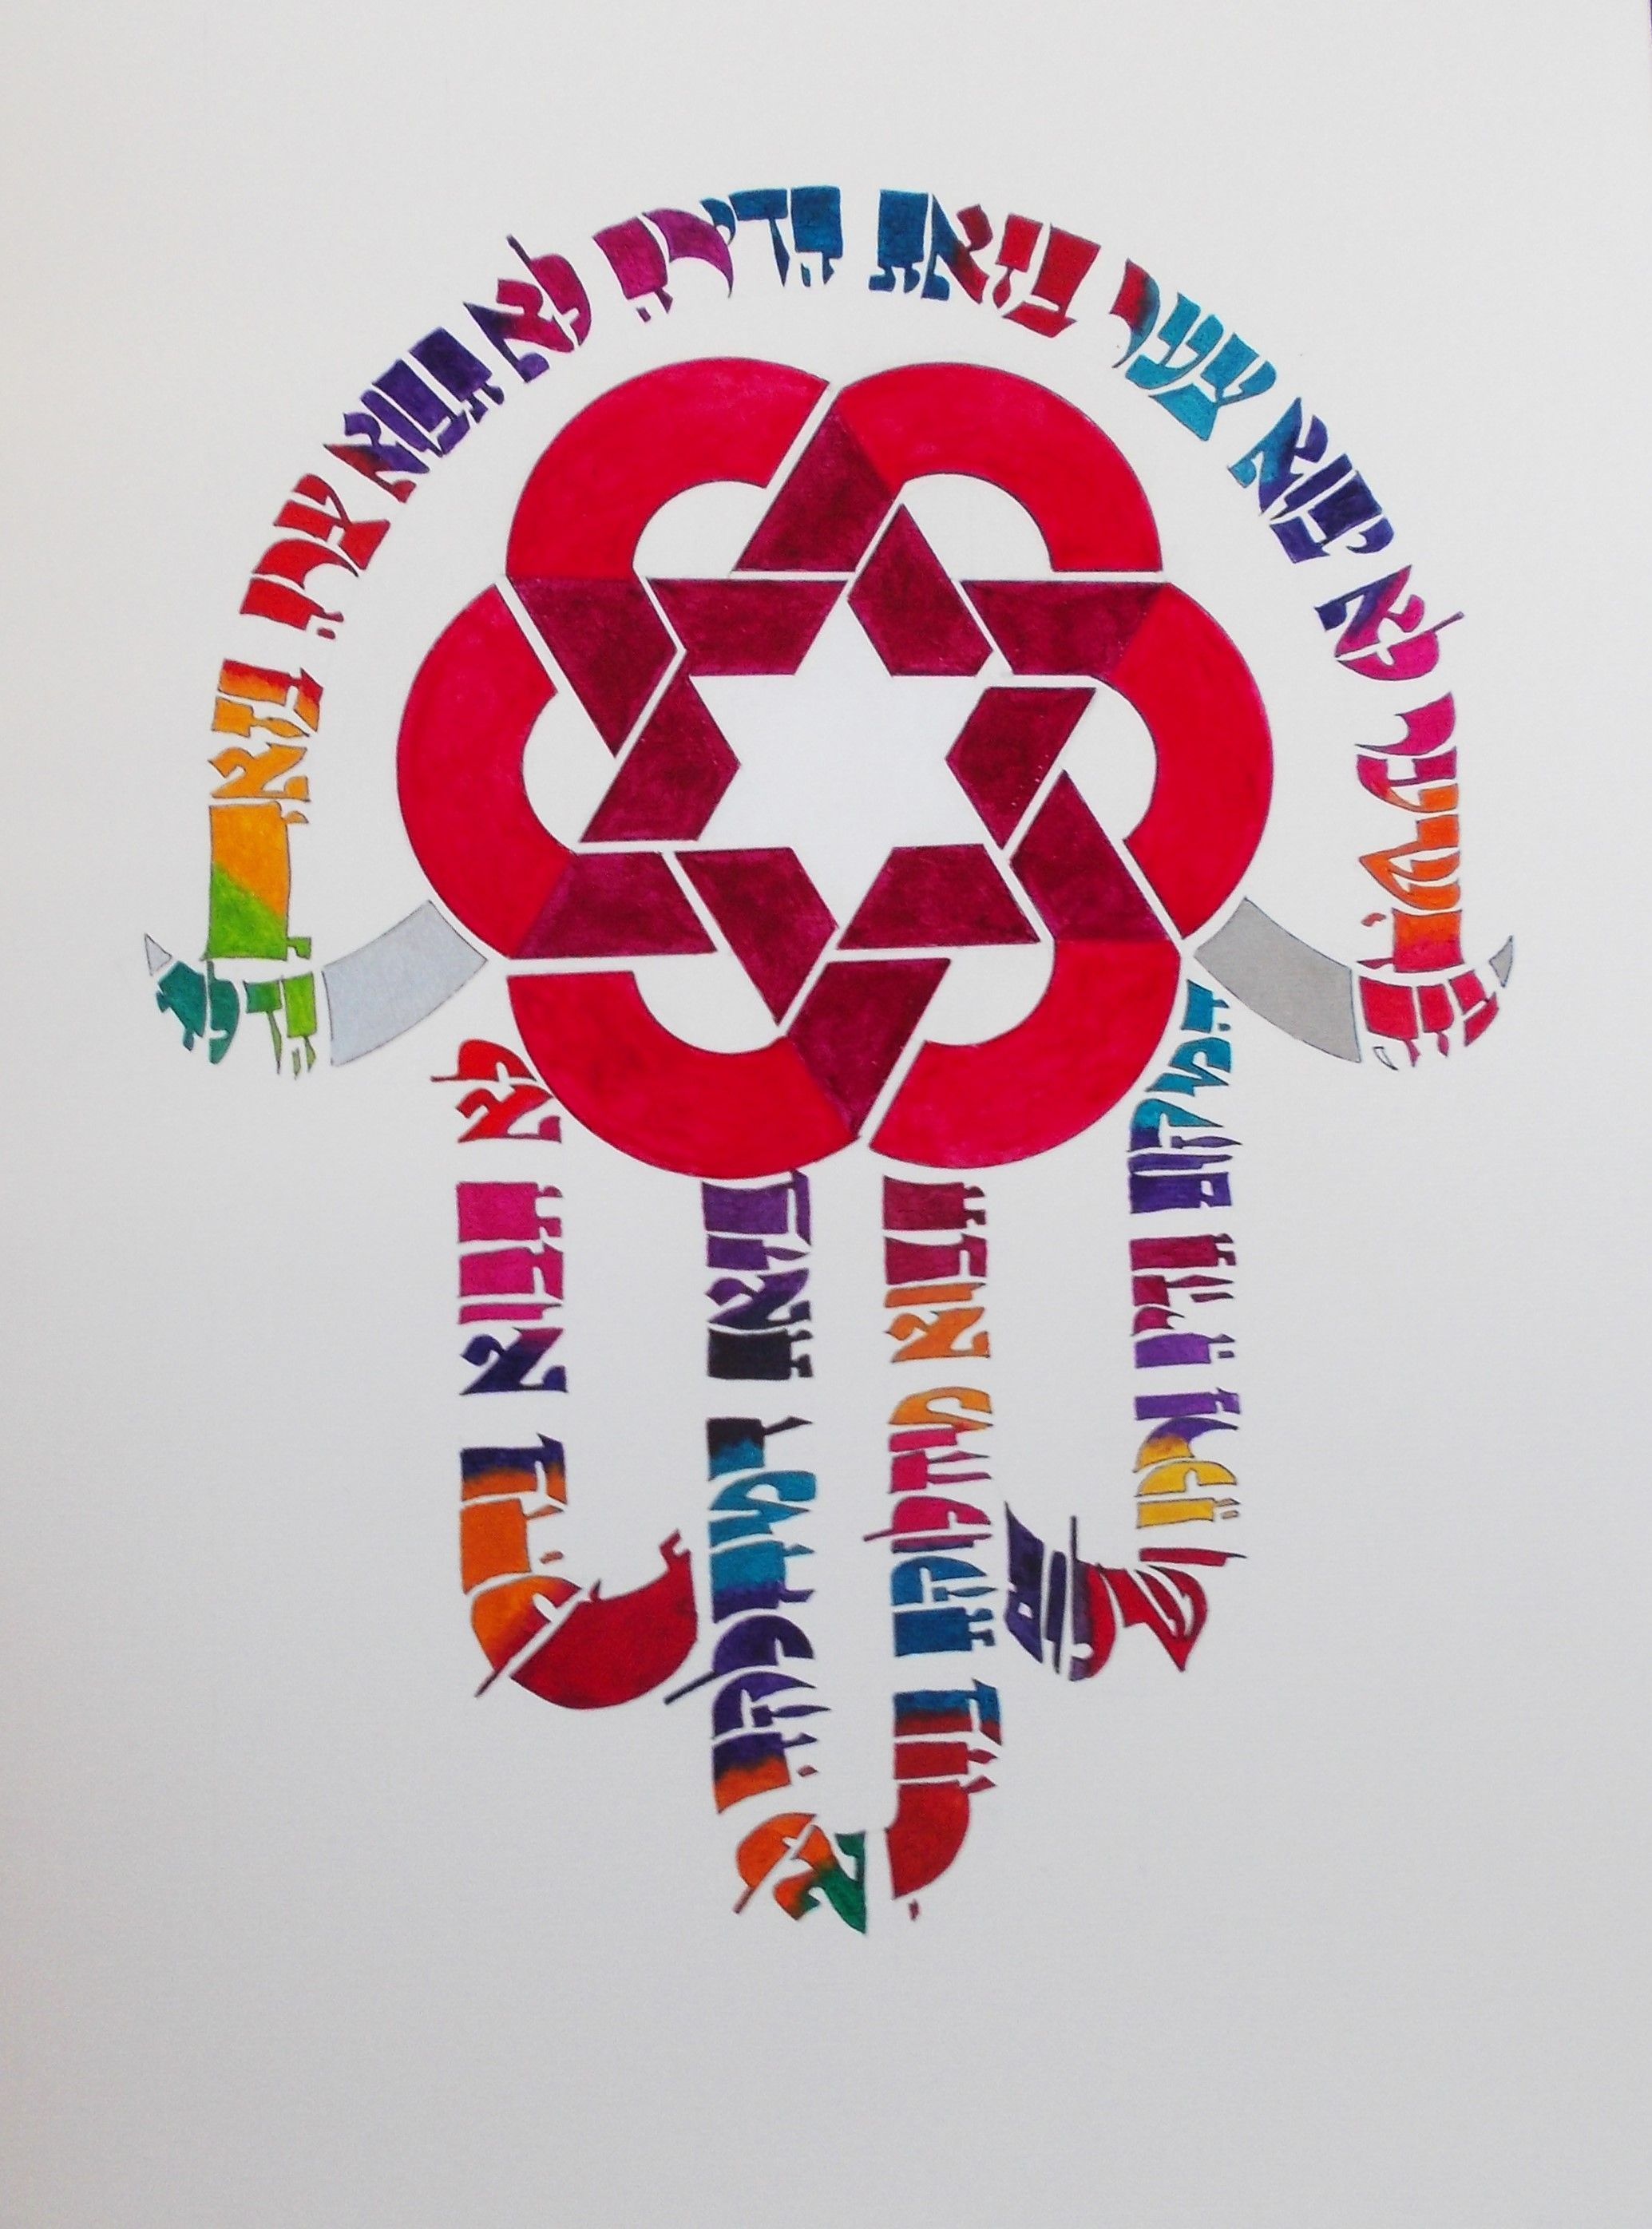 Pin By Cynthia Le Goldstein On Jewish Art Pinterest Jewish Art